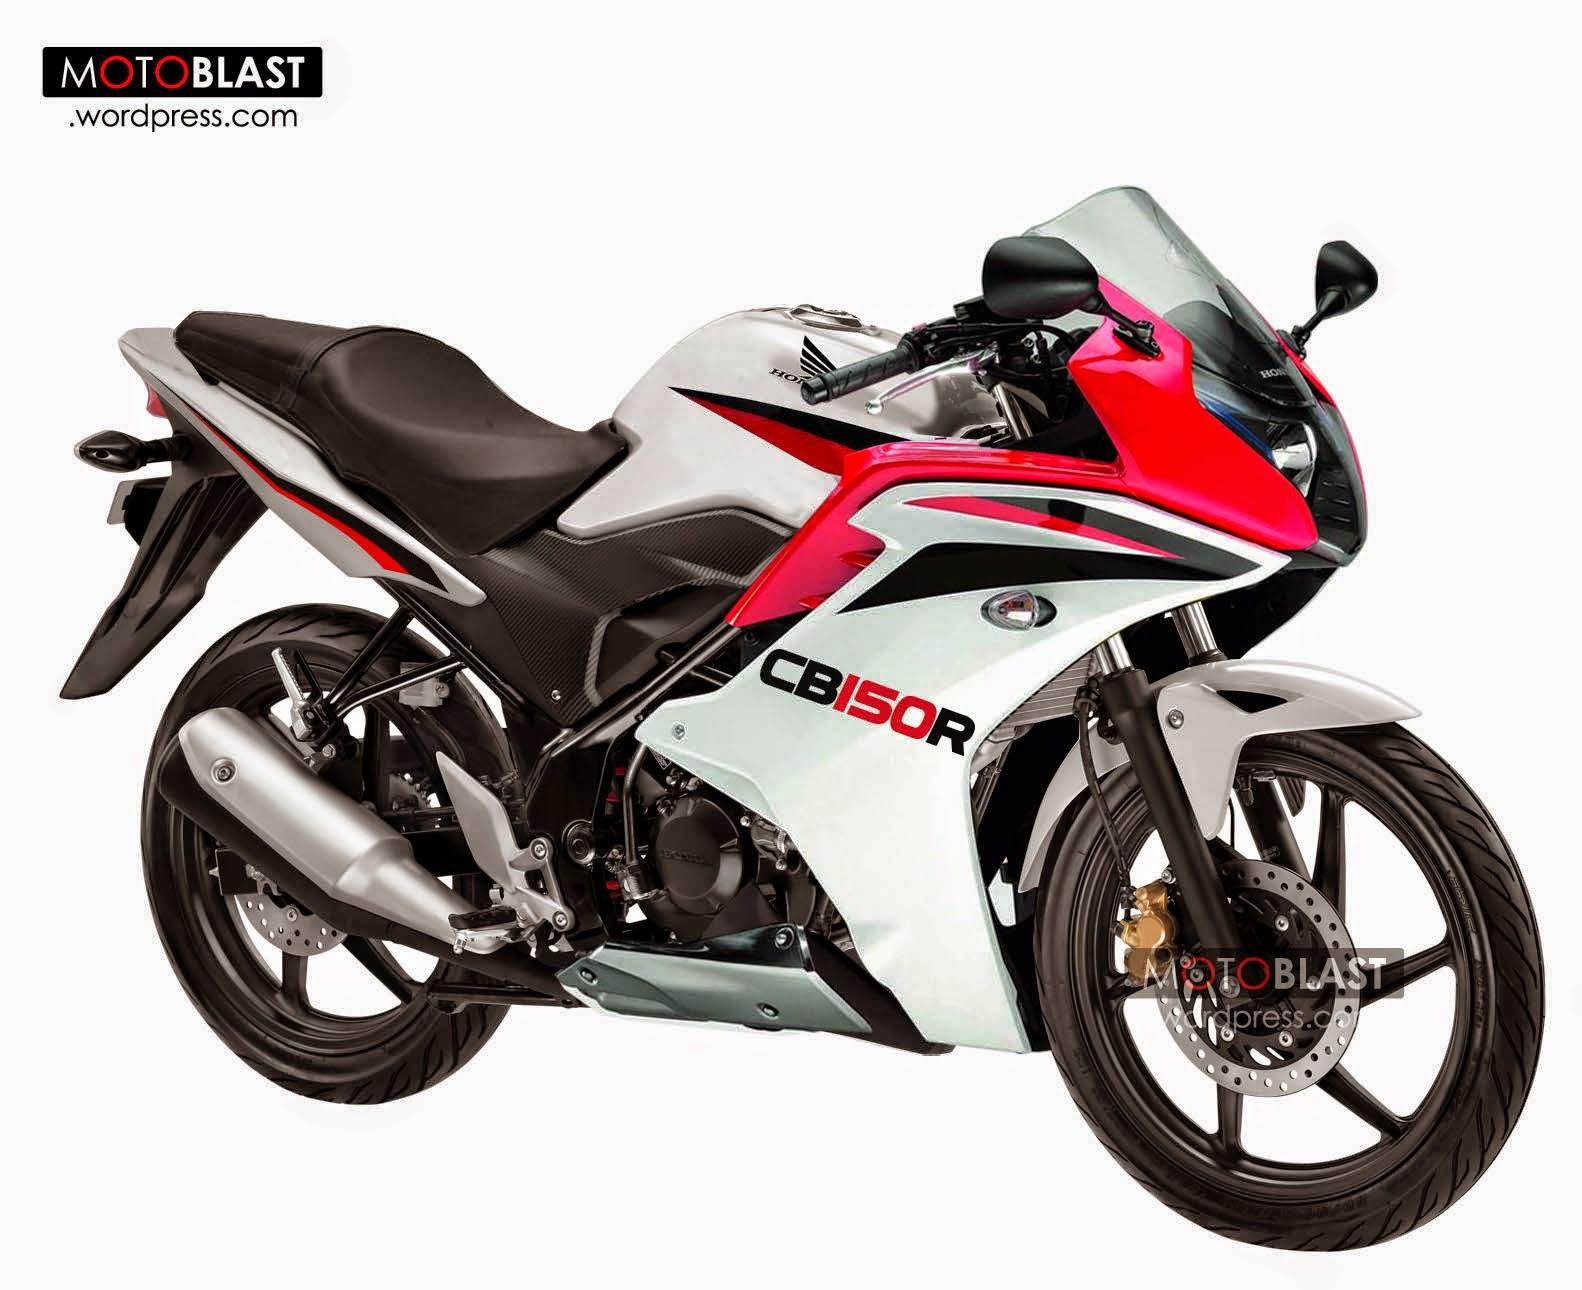 Modifikasi Cb 150 R Street Fighter  Thecitycyclist